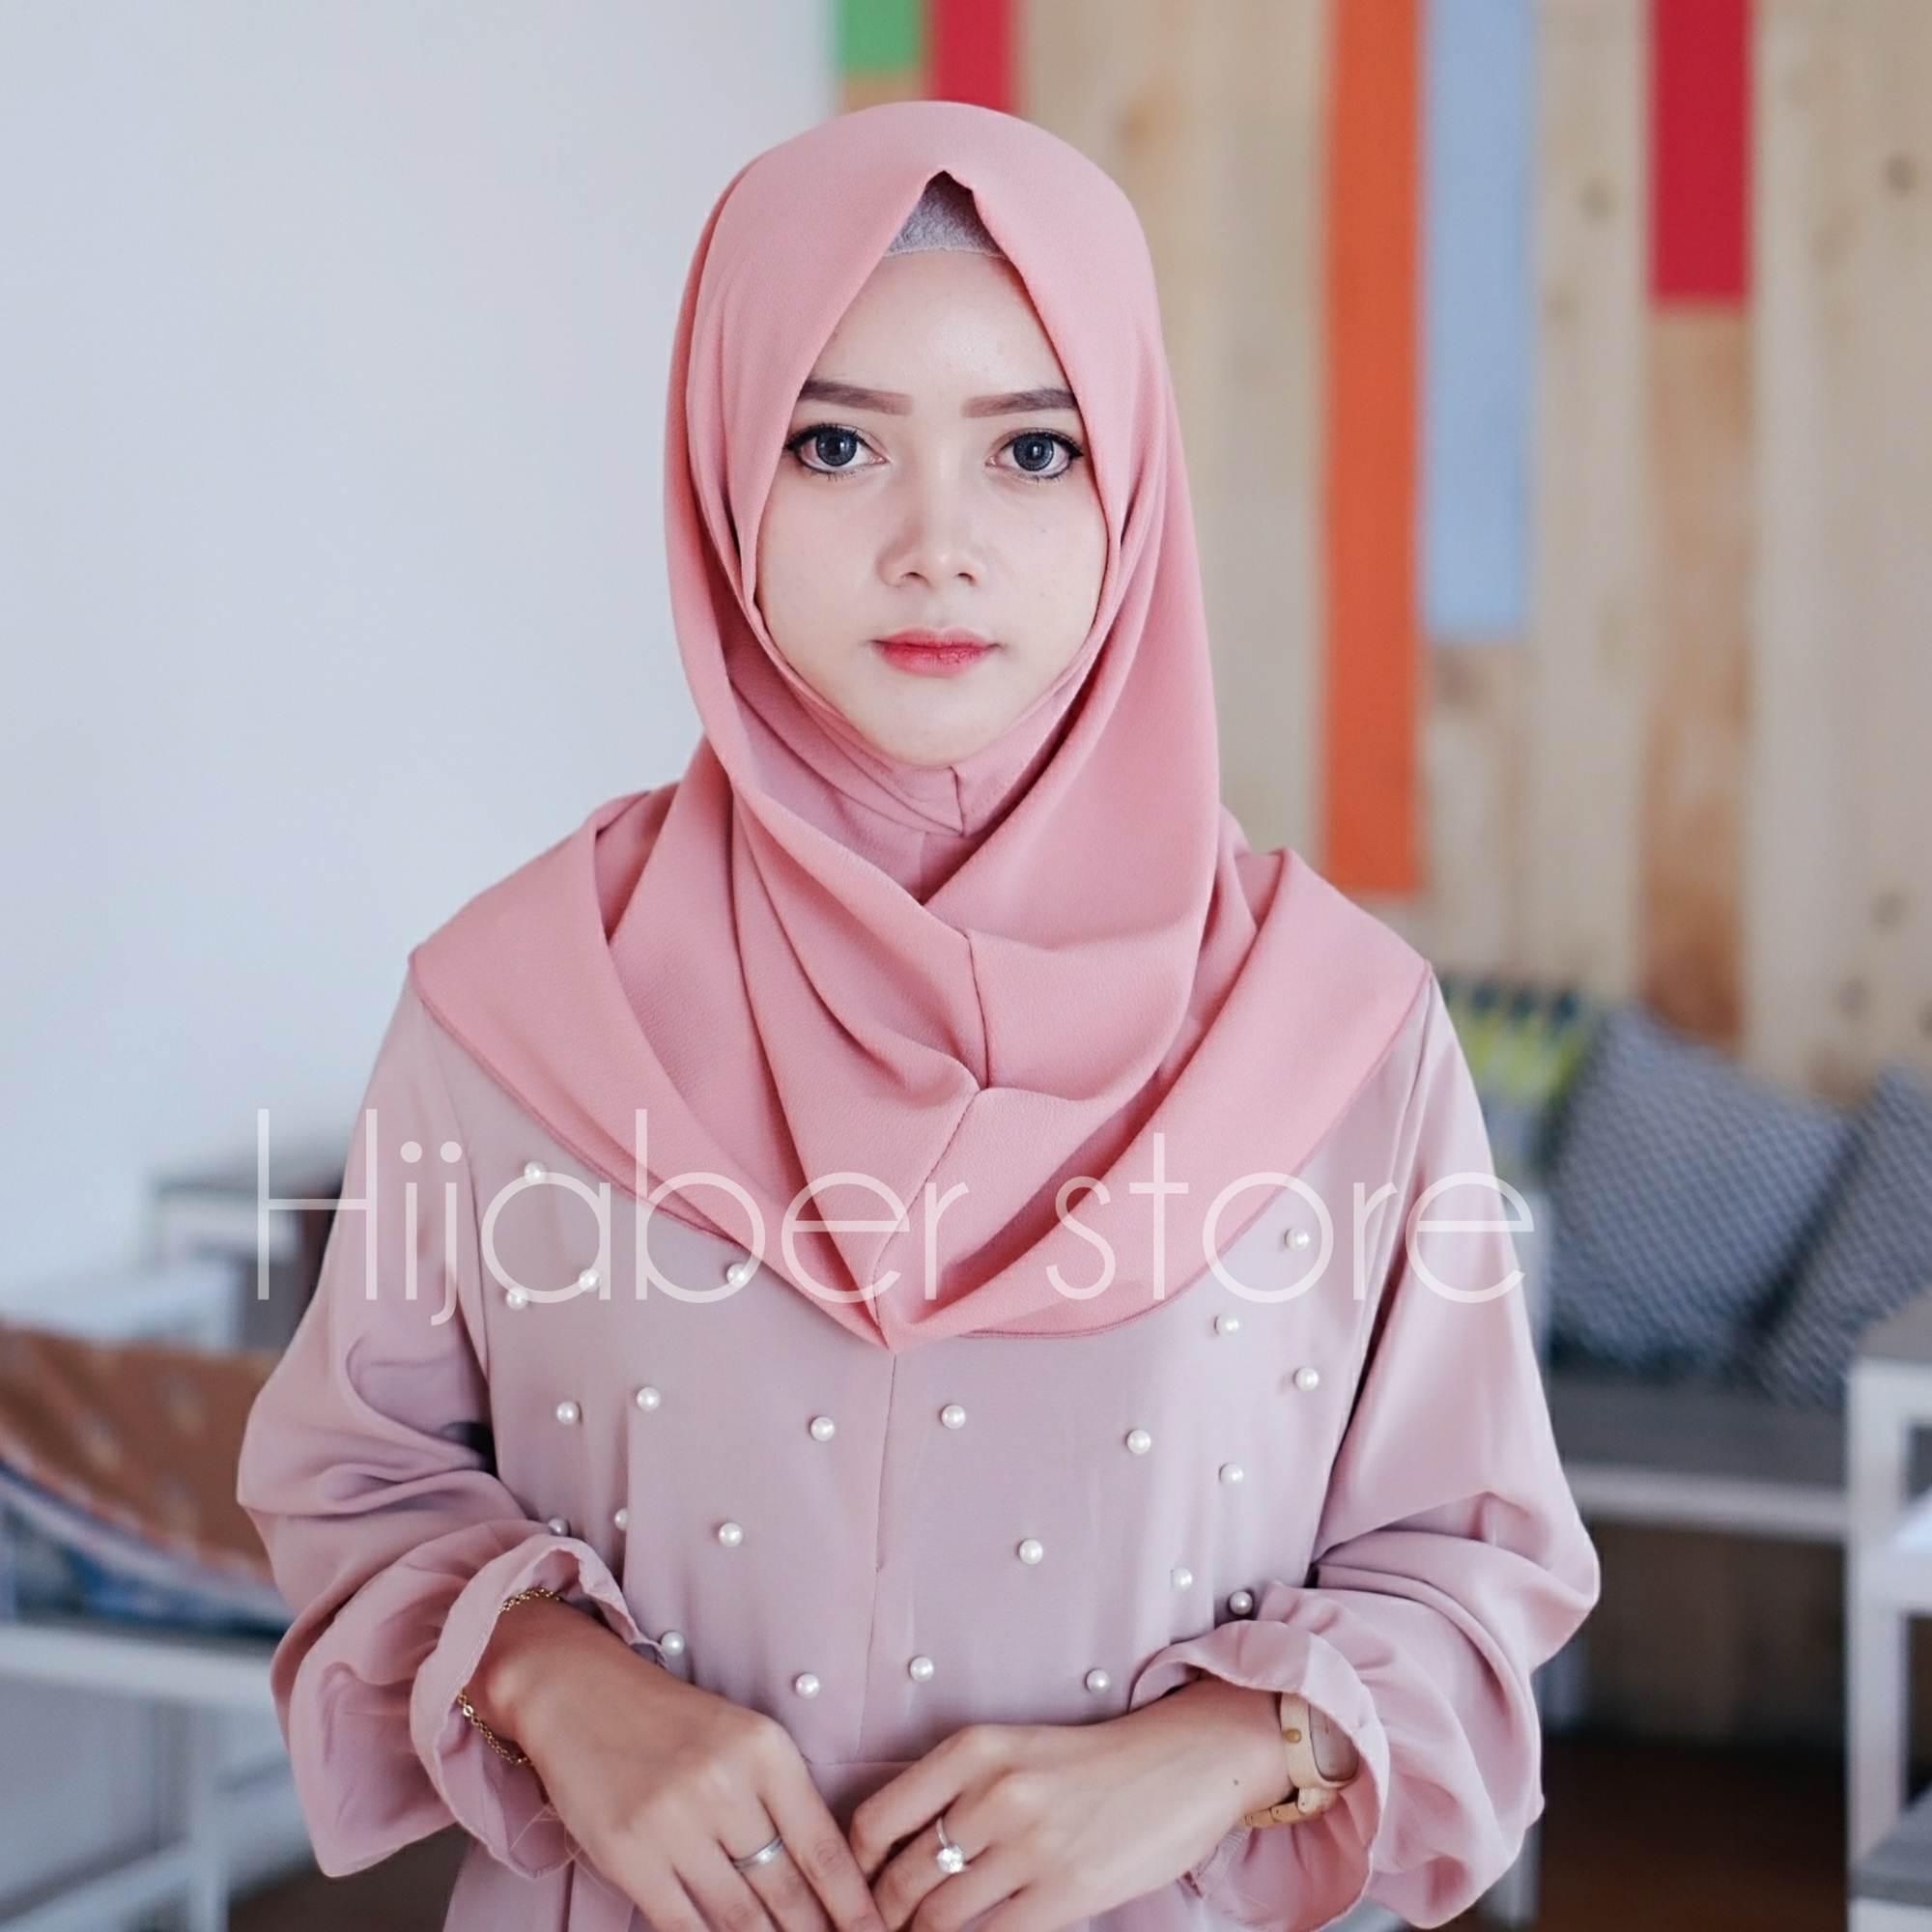 PROMO Jilbab Hijab Instan Shalwa Kerudung Instan Salwa Bahan Bubble Premium